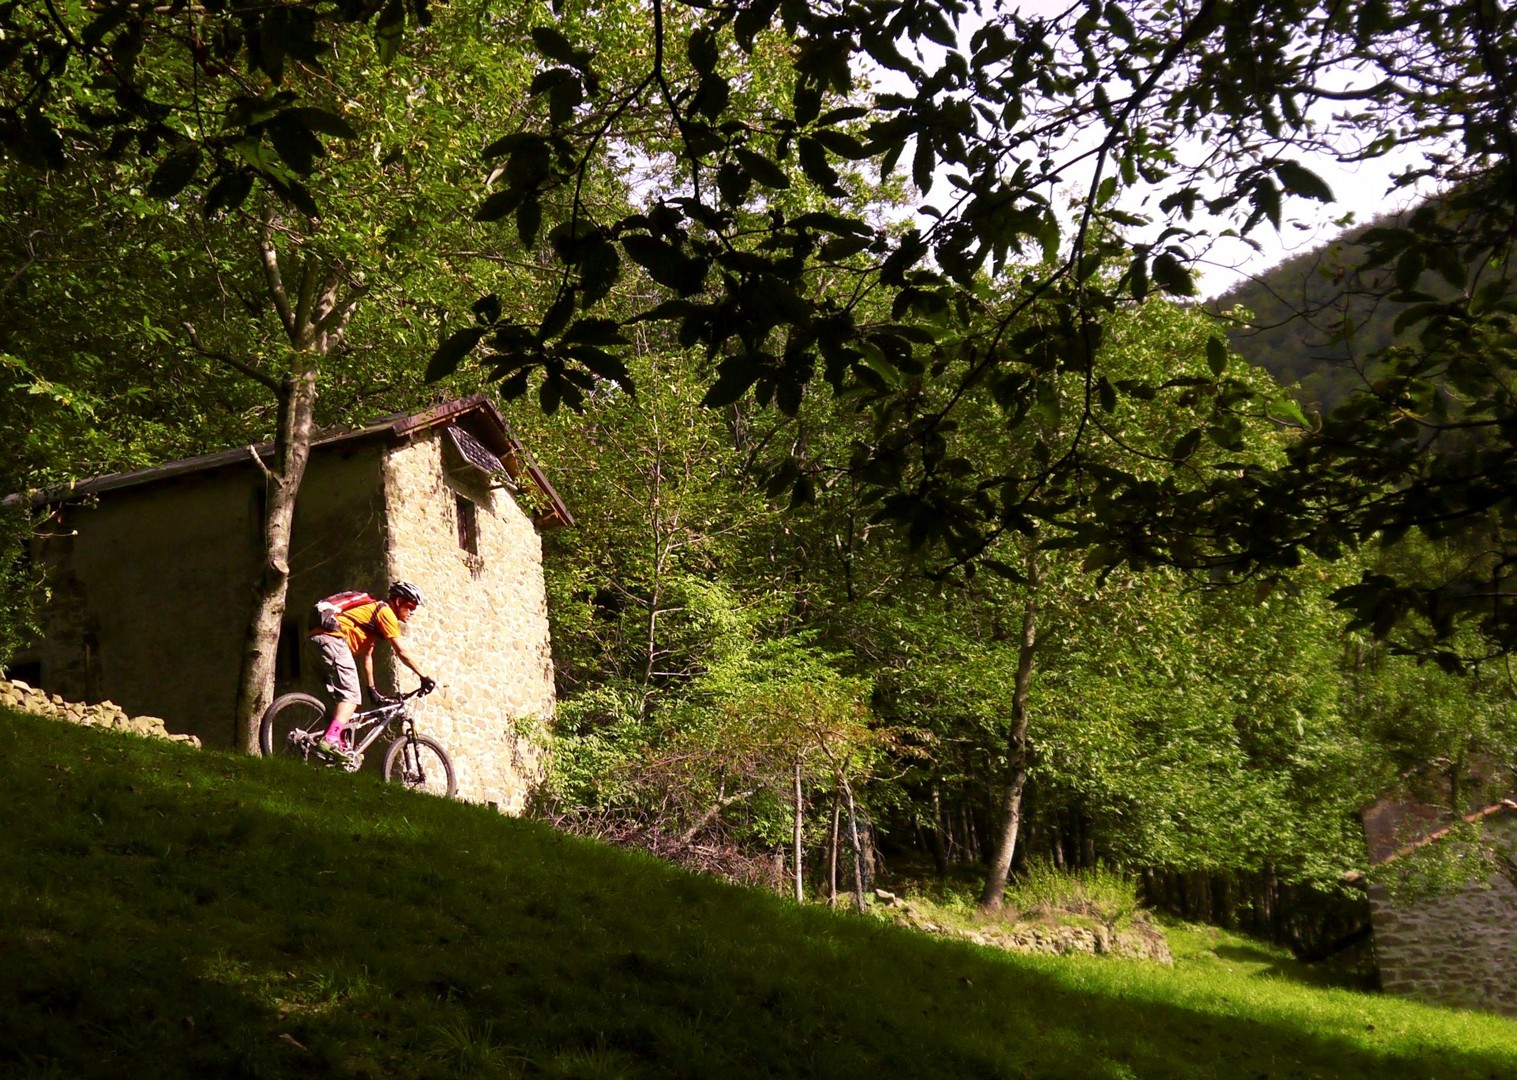 mountain-bike-via-francigena-self-guided-holiday-italy-skedaddle.jpg - Italy - Via Francigena (Tuscany to Rome) - Self-Guided Mountain Bike Holiday - Mountain Biking